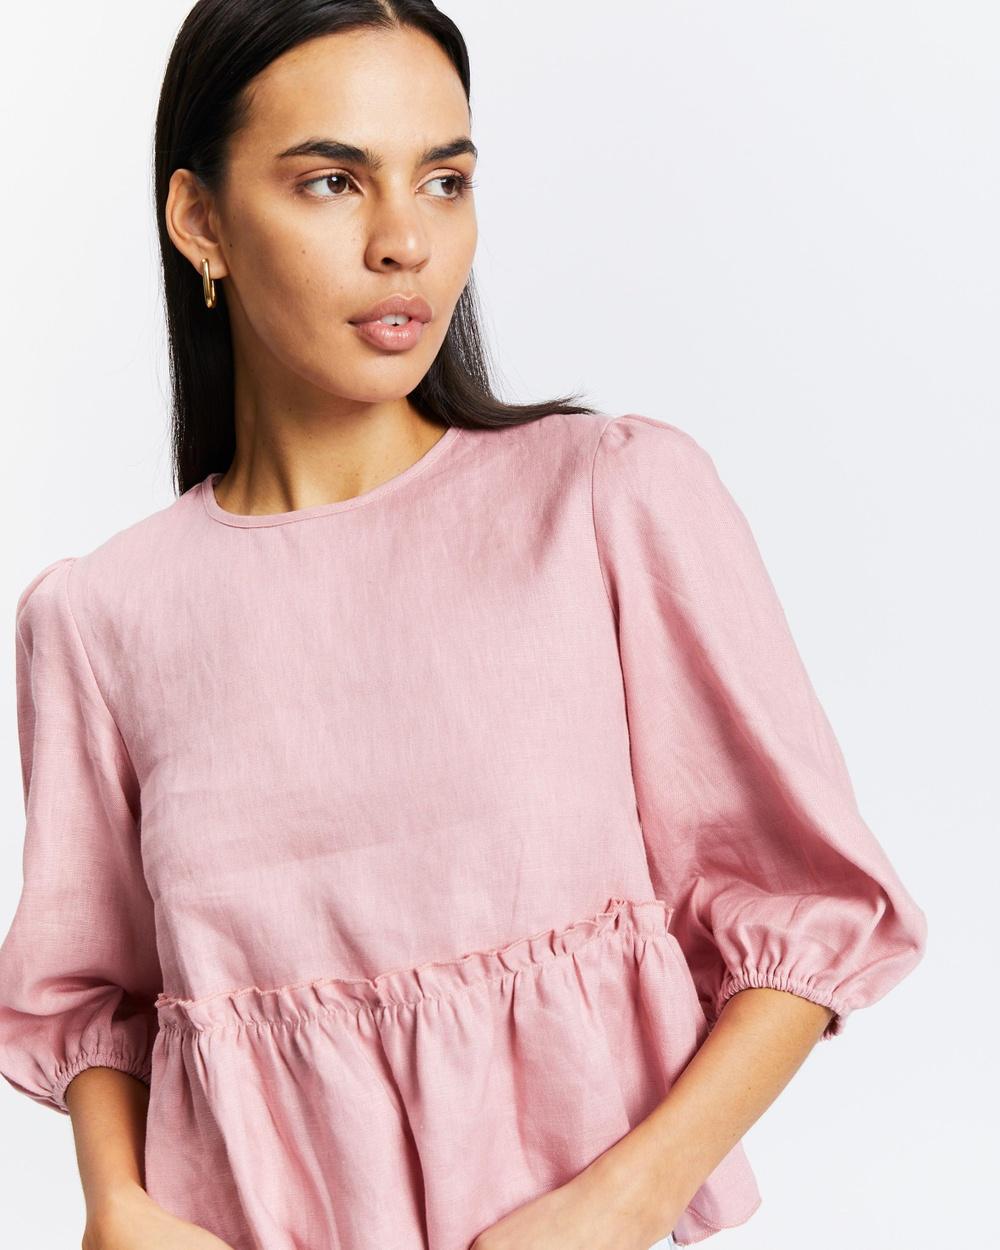 AERE Linen Peplum Top Tops Pink